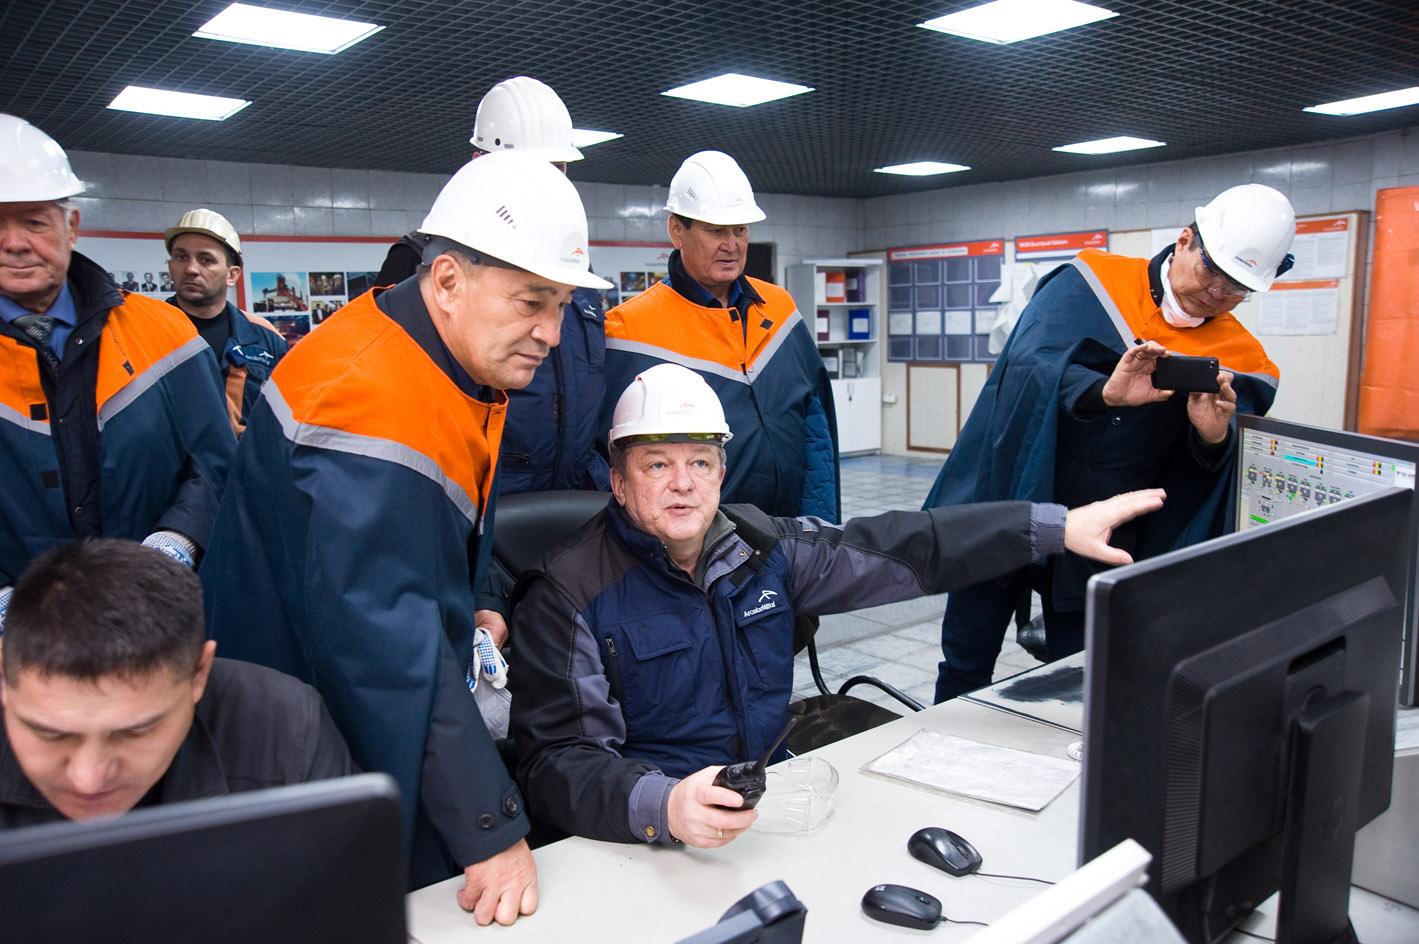 Председатель Федерации профсоюзов РК Е.Тугжанов провел встречу с руководством АО «АрселорМиттал Темиртау»